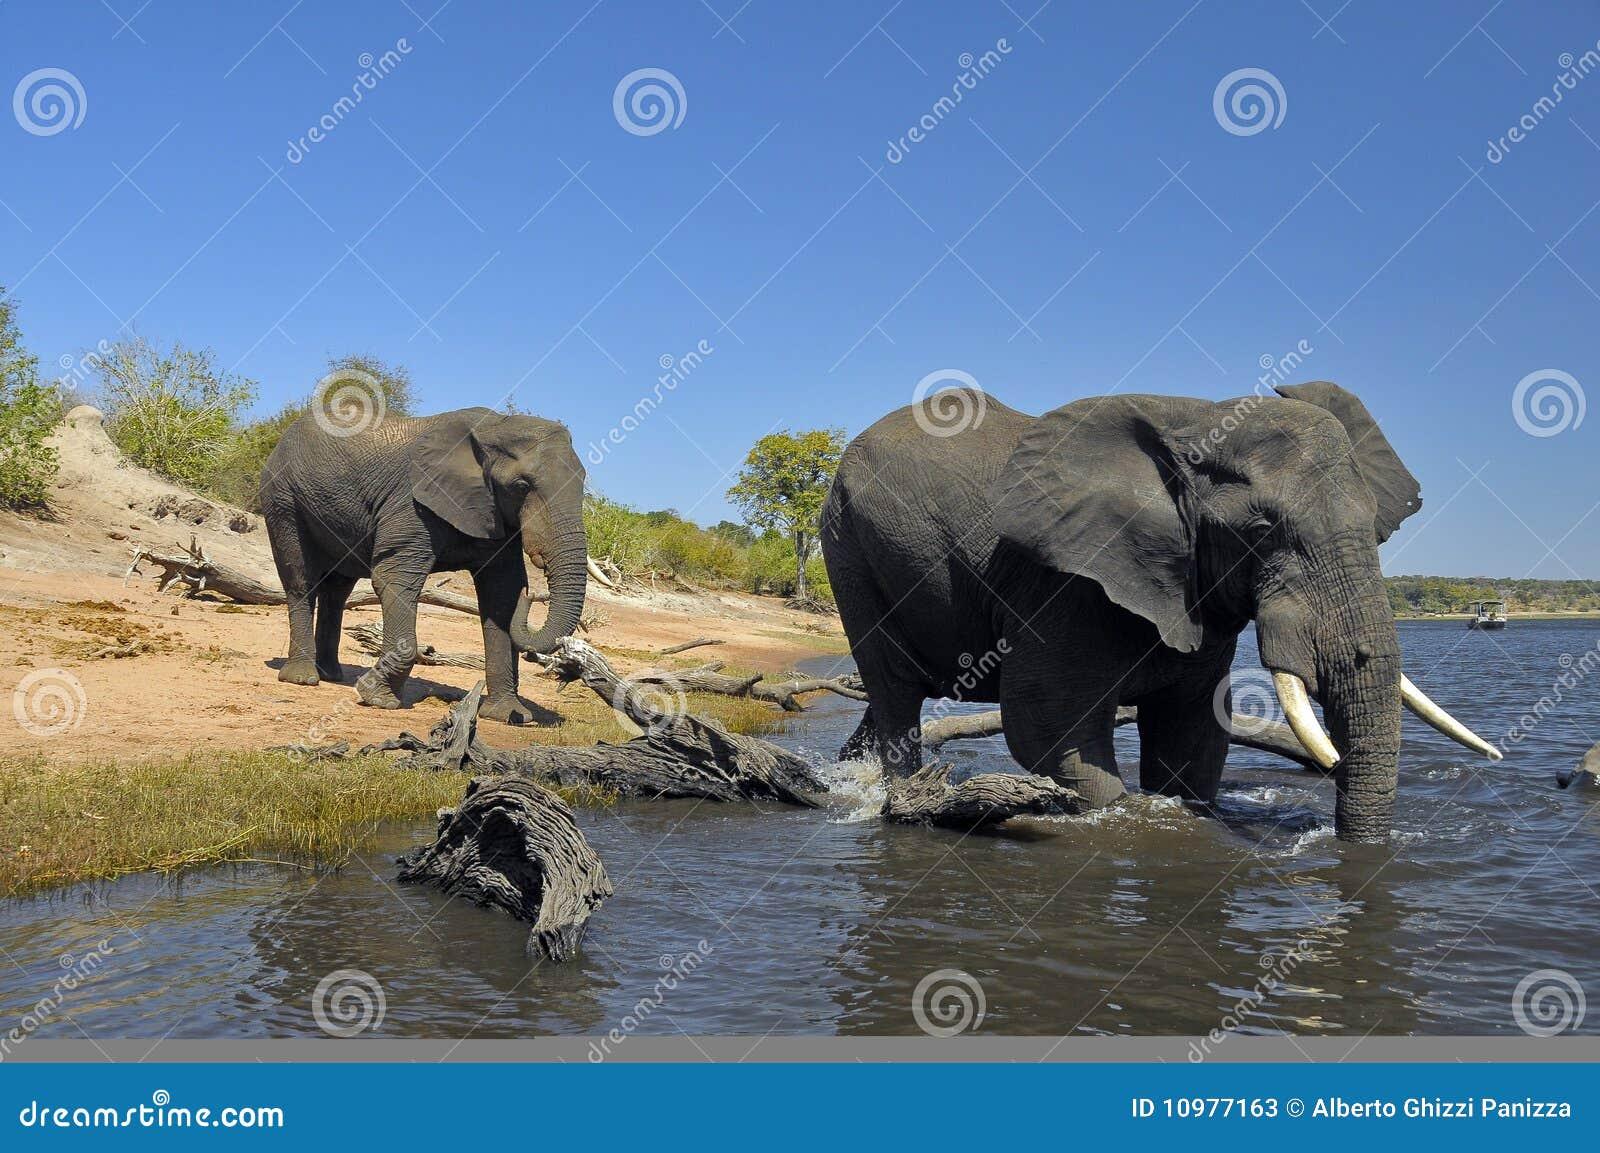 A bathe in Chobe river